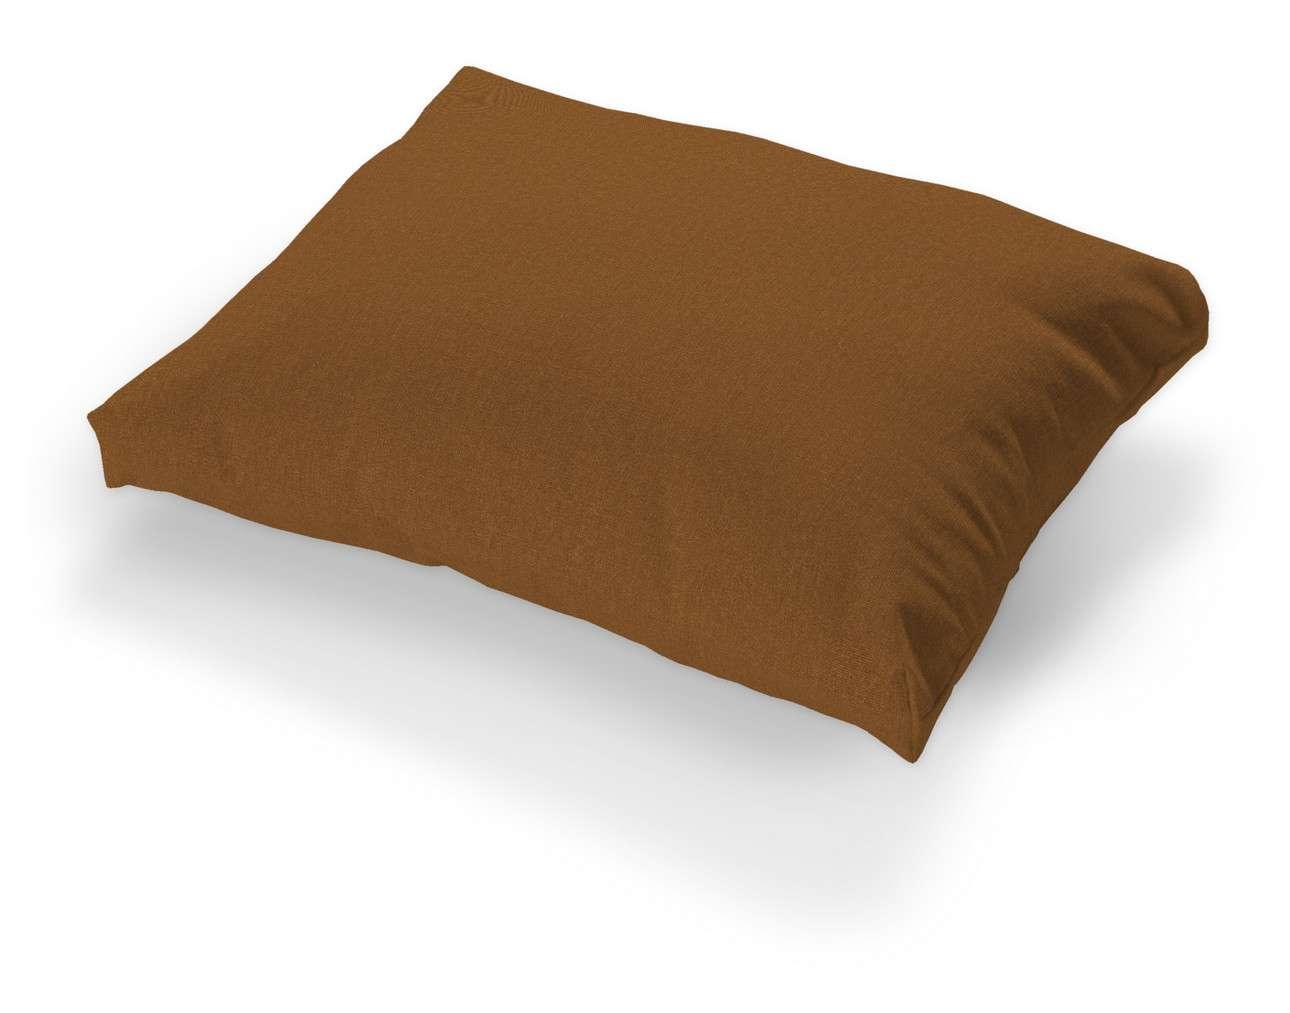 Poszewka na poduszkę Tylösand 1 szt. w kolekcji Living, tkanina: 161-28